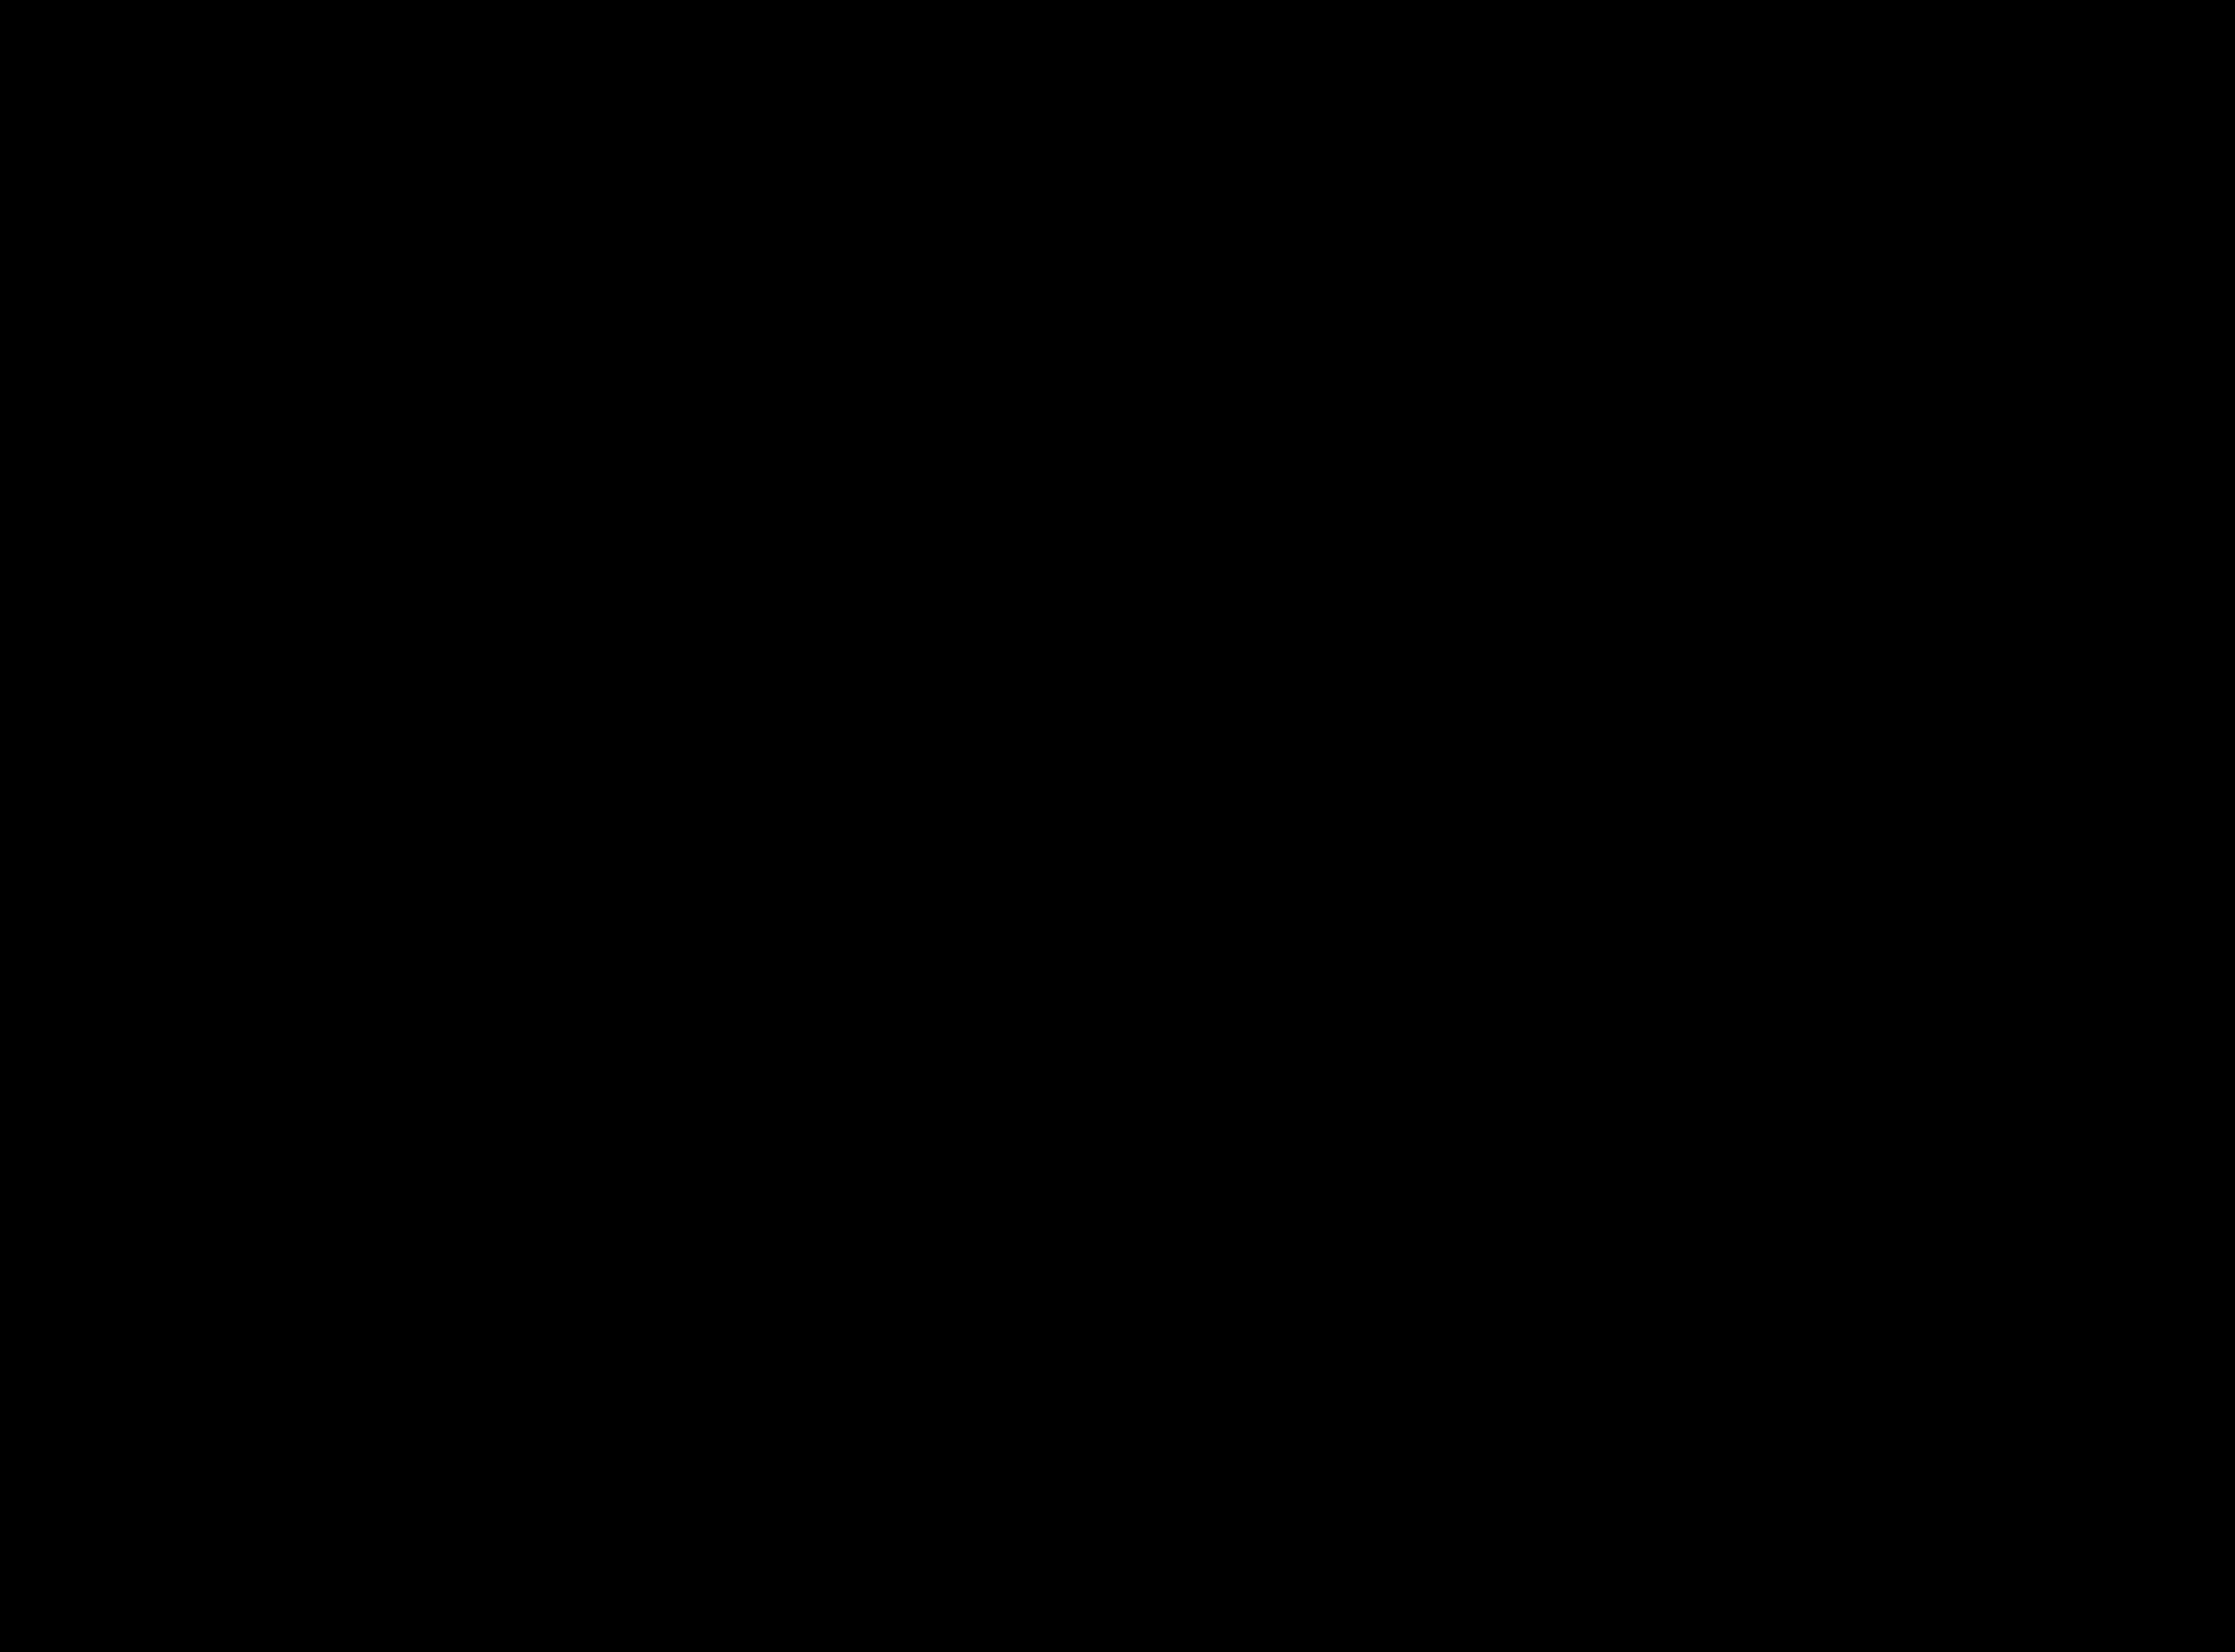 2400x1774 Clipart